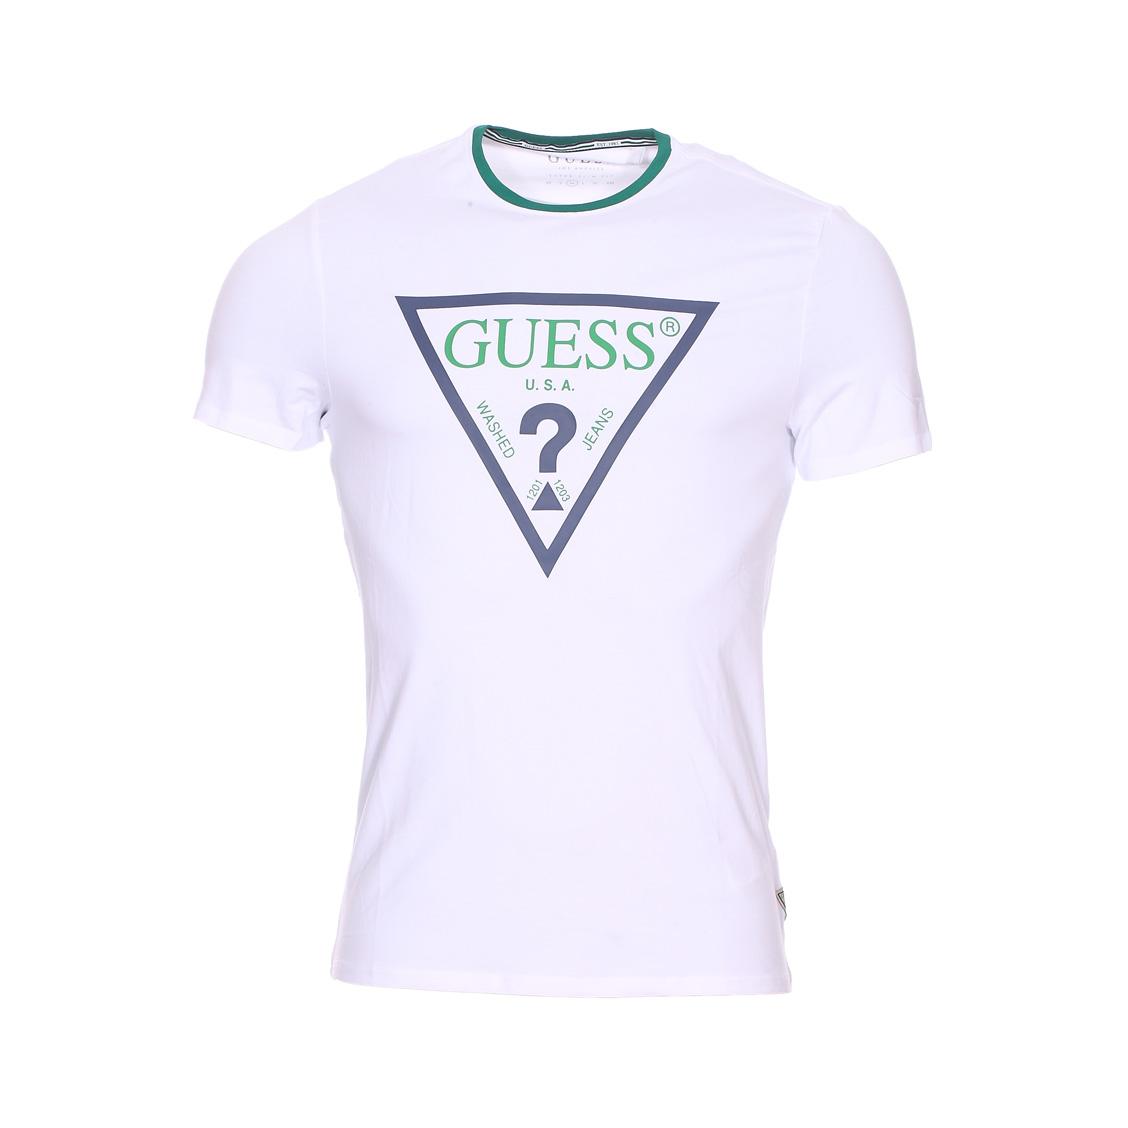 Tee-shirt col rond guess club en coton stretch blanc floqué en vert et bleu marine